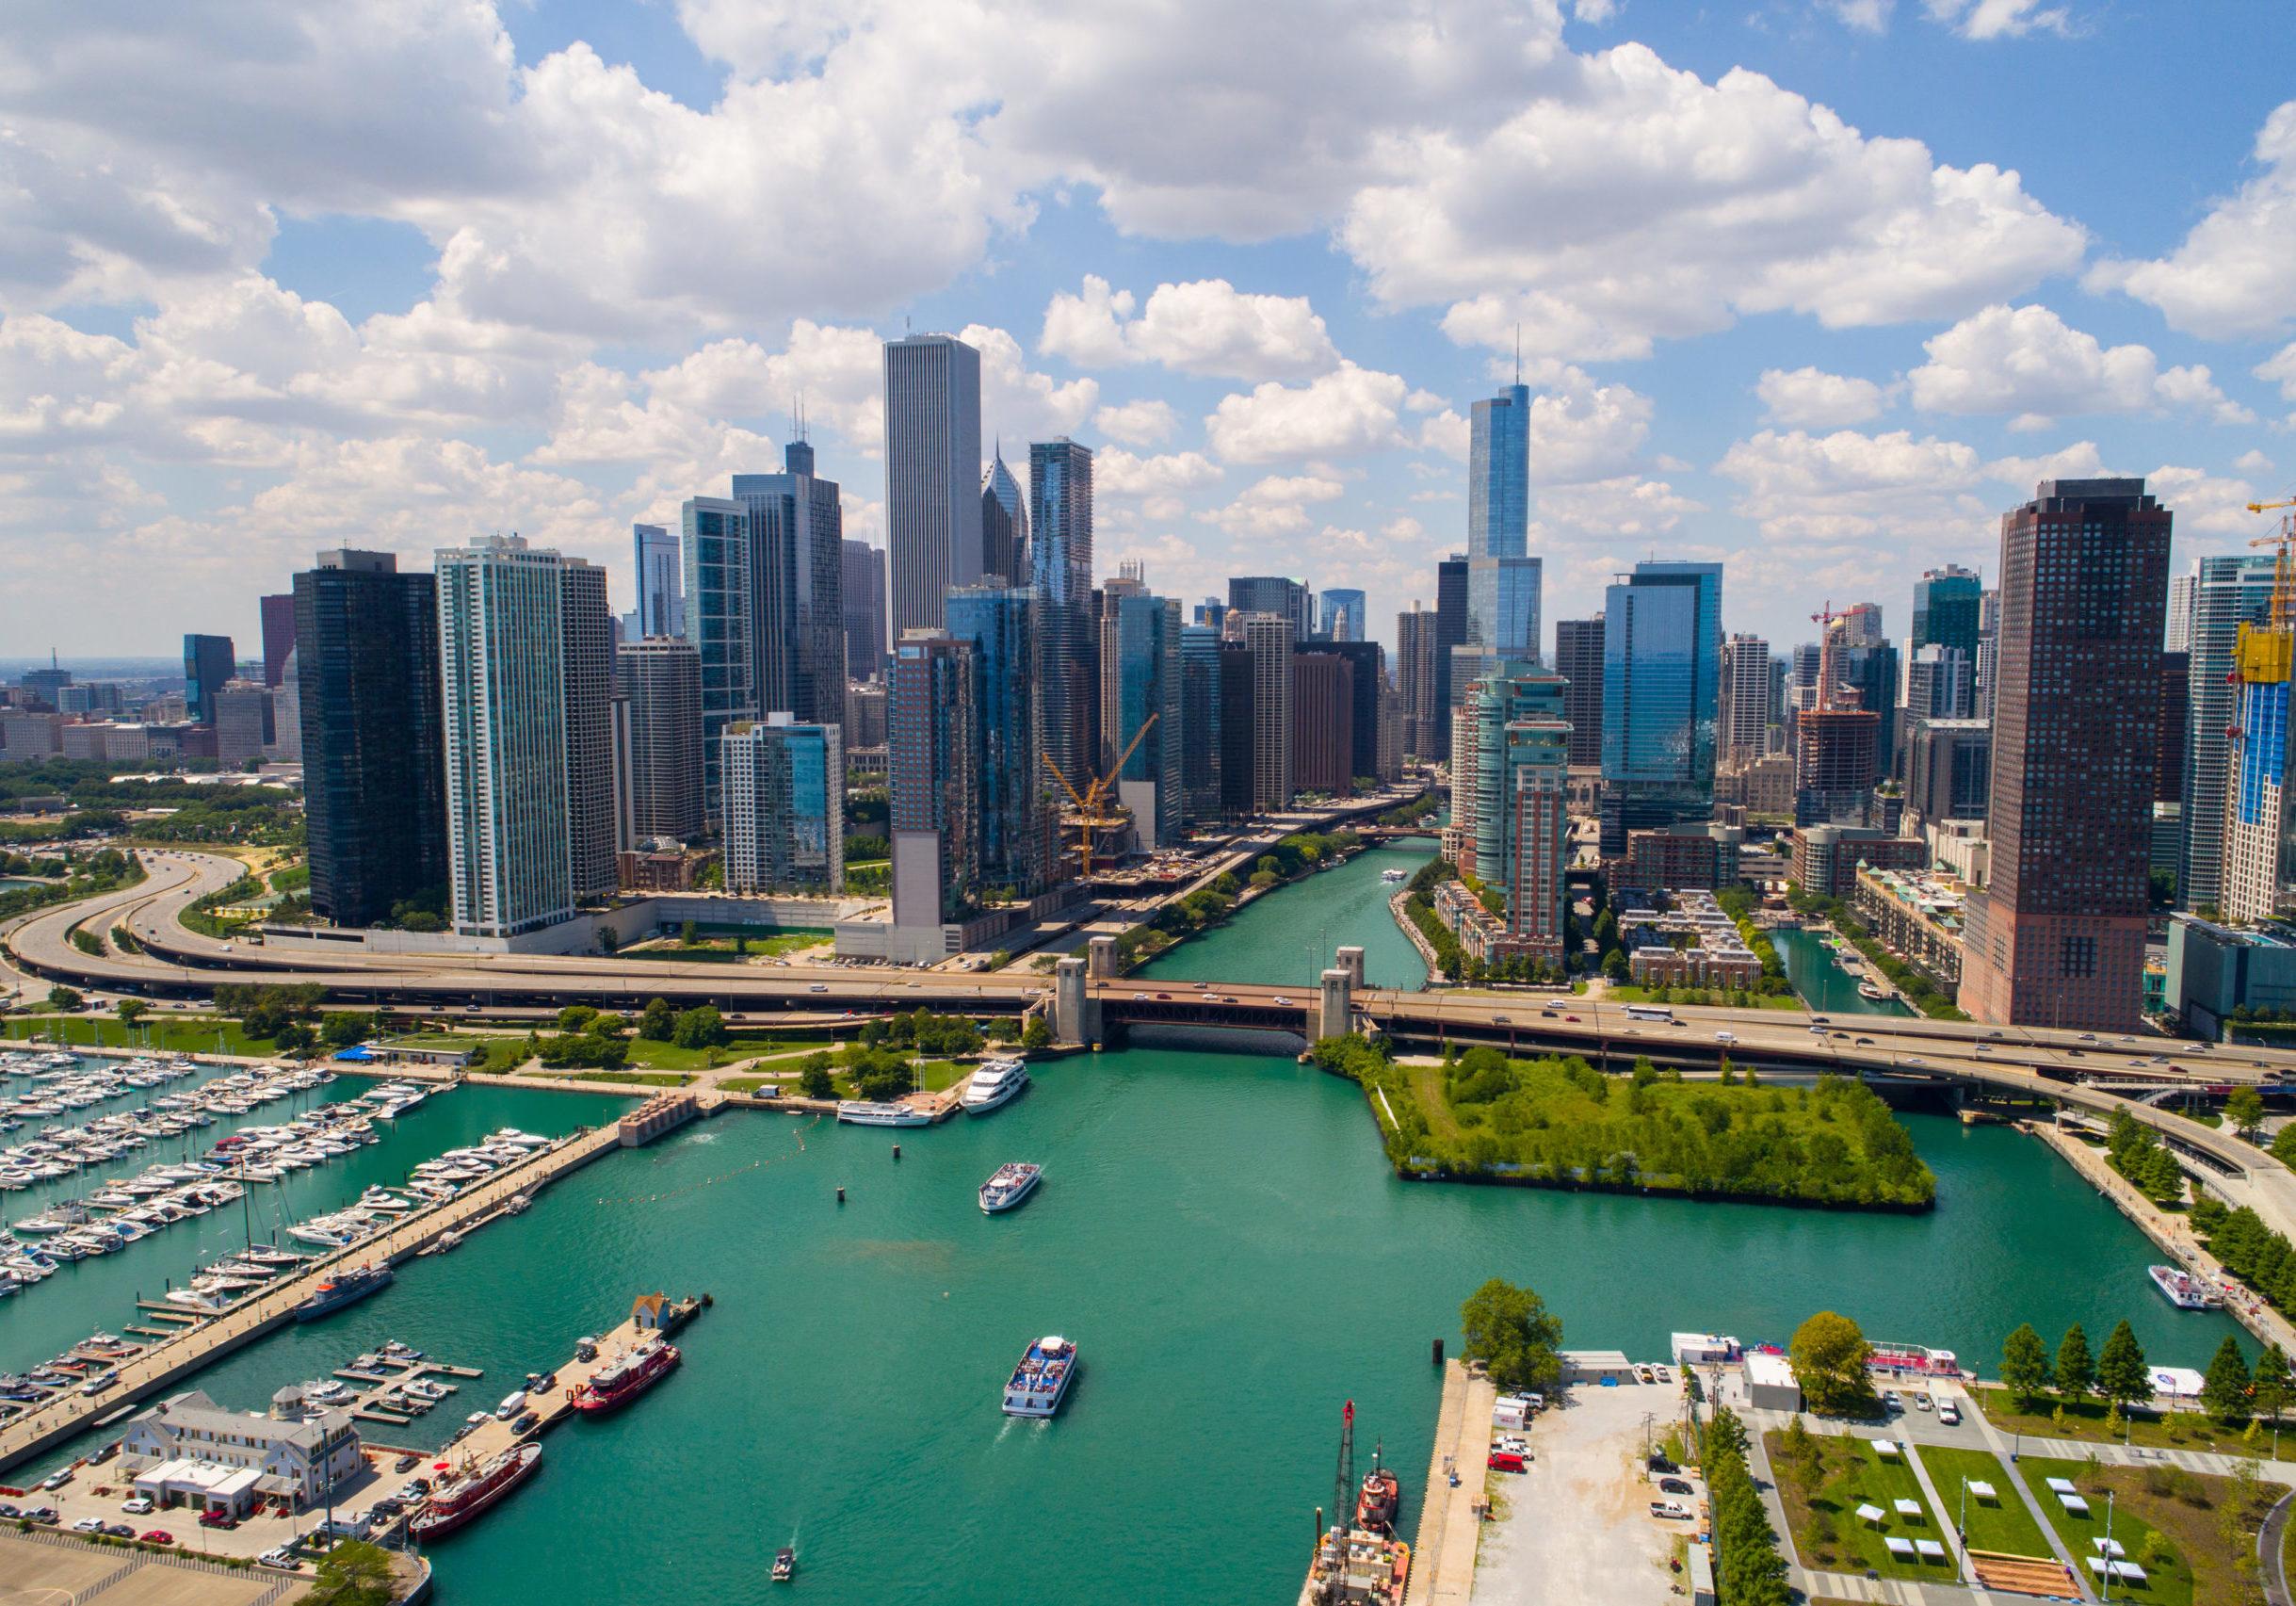 Chicago Tower Bestway Freight